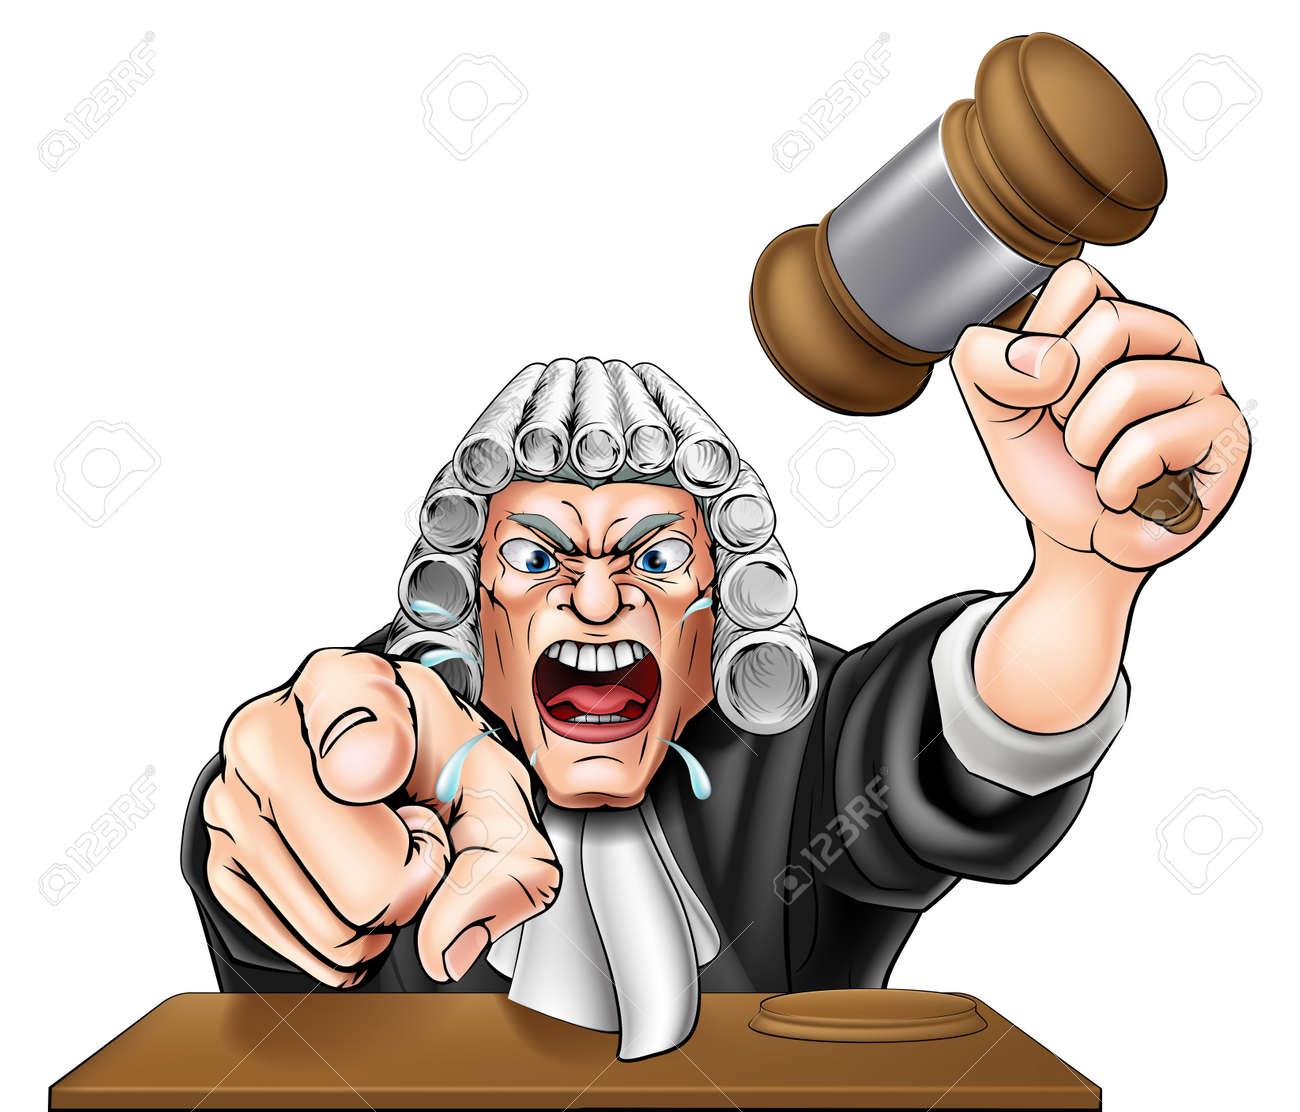 an illustration of an angry judge cartoon character shouting rh 123rf com Cartoon Court Jail Clip Art